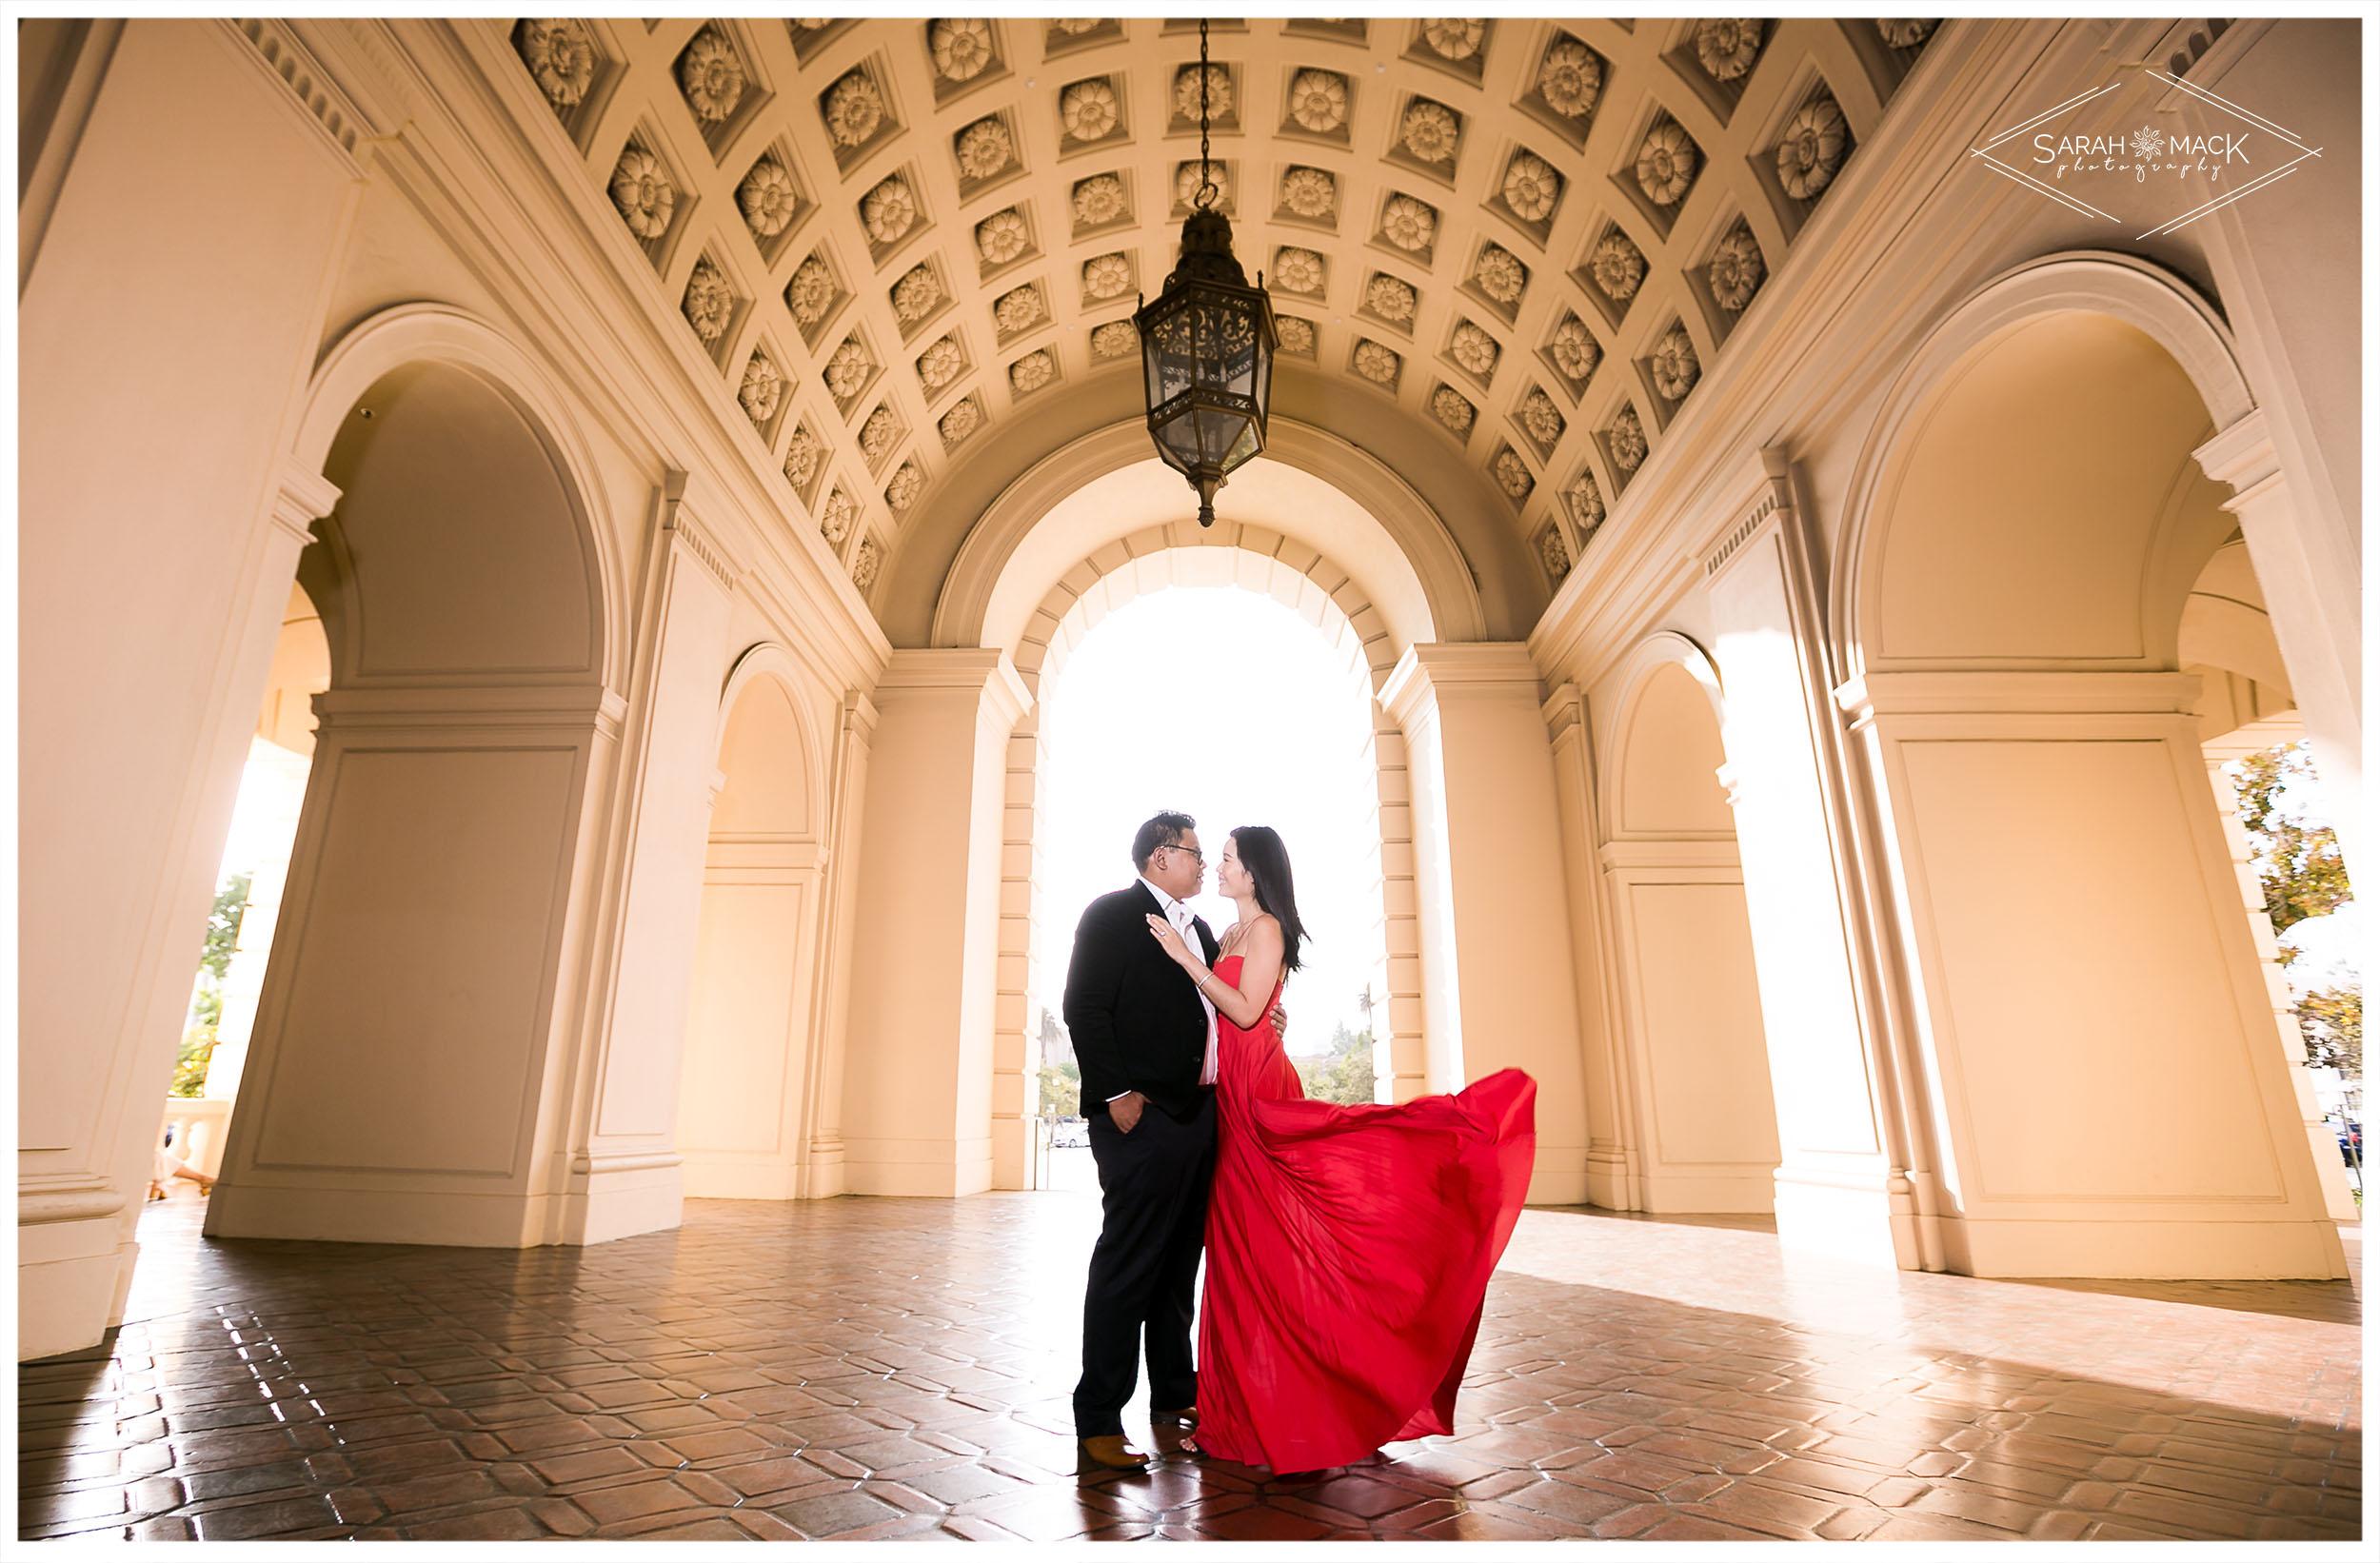 CM-Pasadena-City-Hall-Engagement-12.jpg